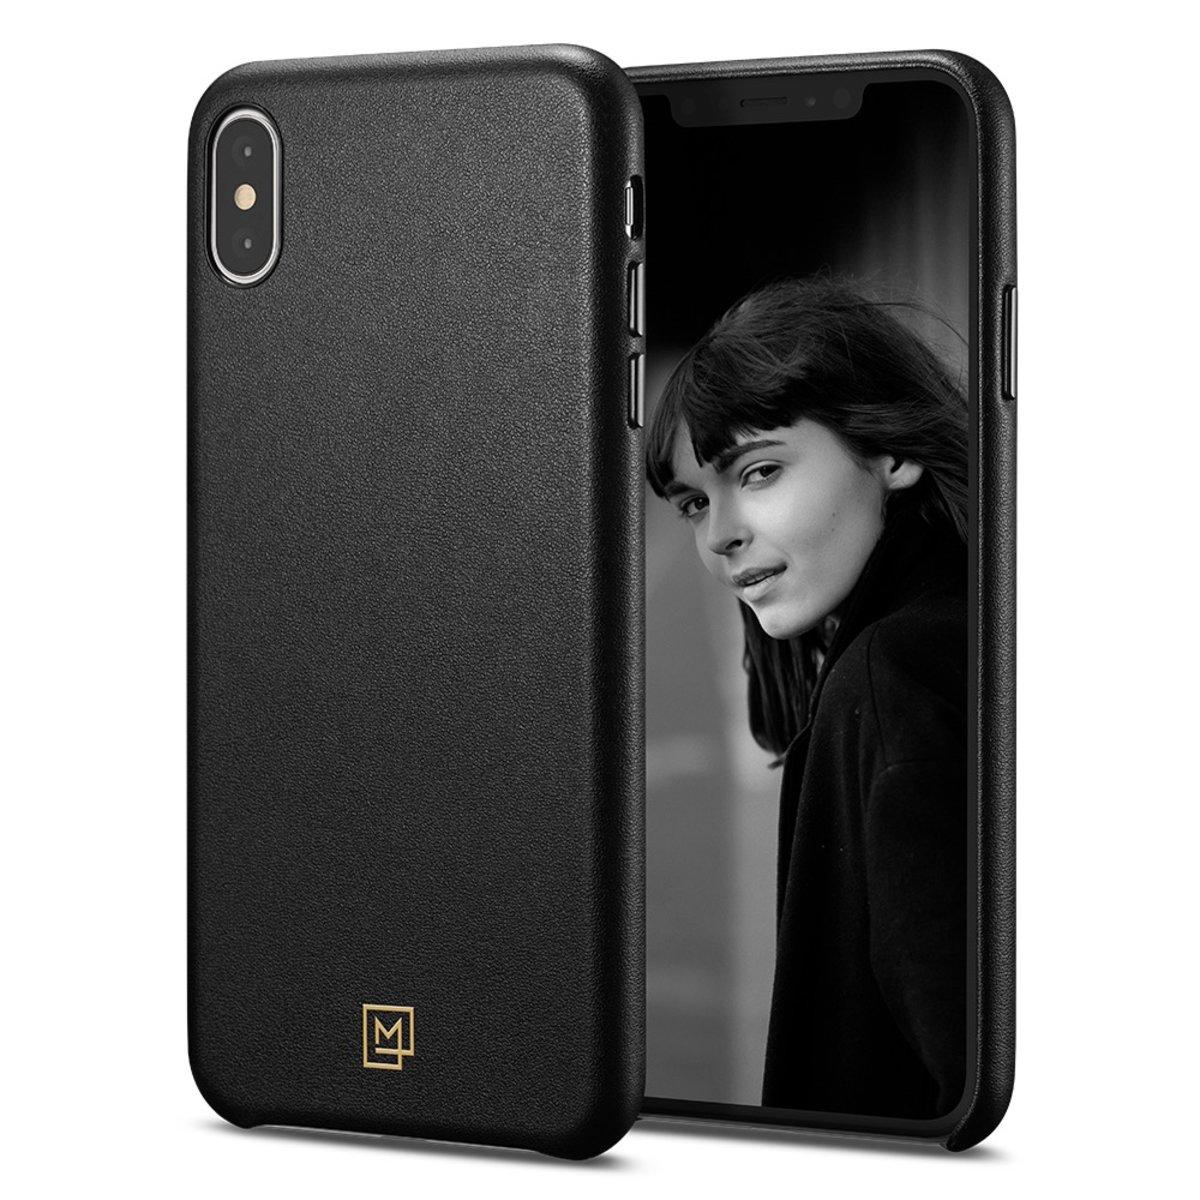 iPhone XS Max La Manon câlin 保護殼 - 黑